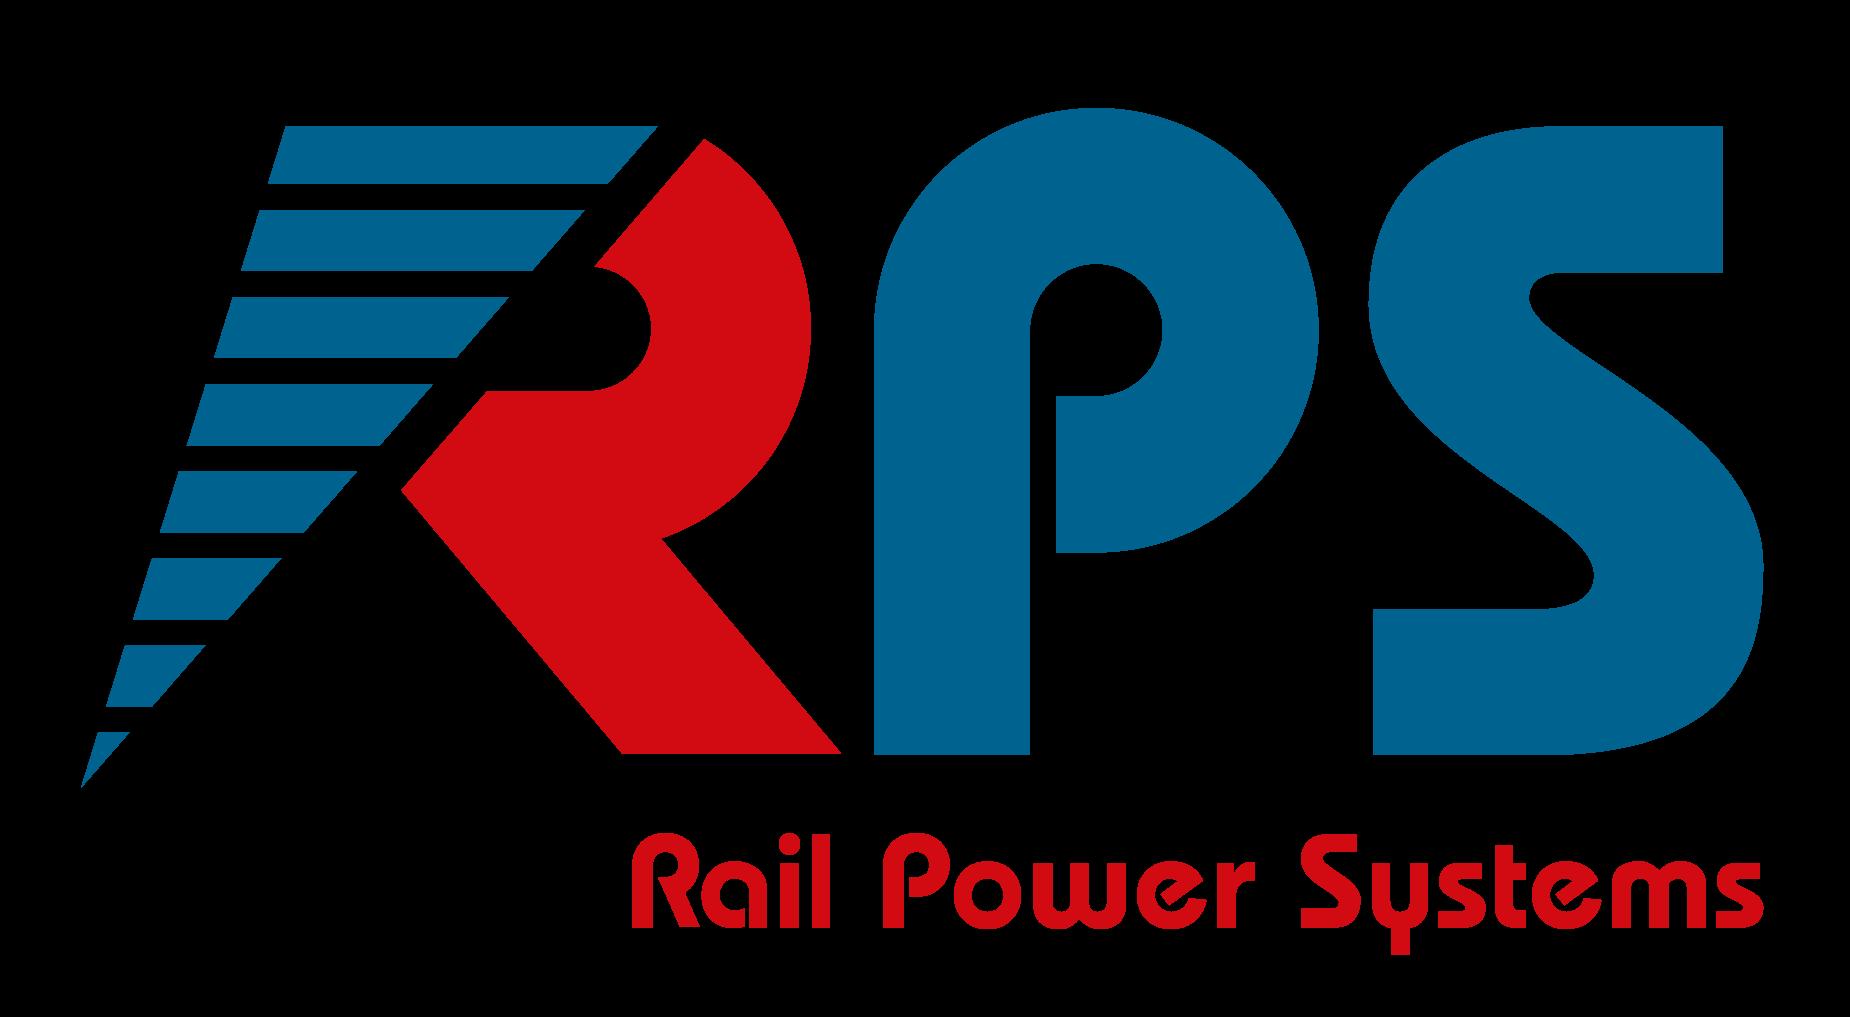 Rail Power Systems